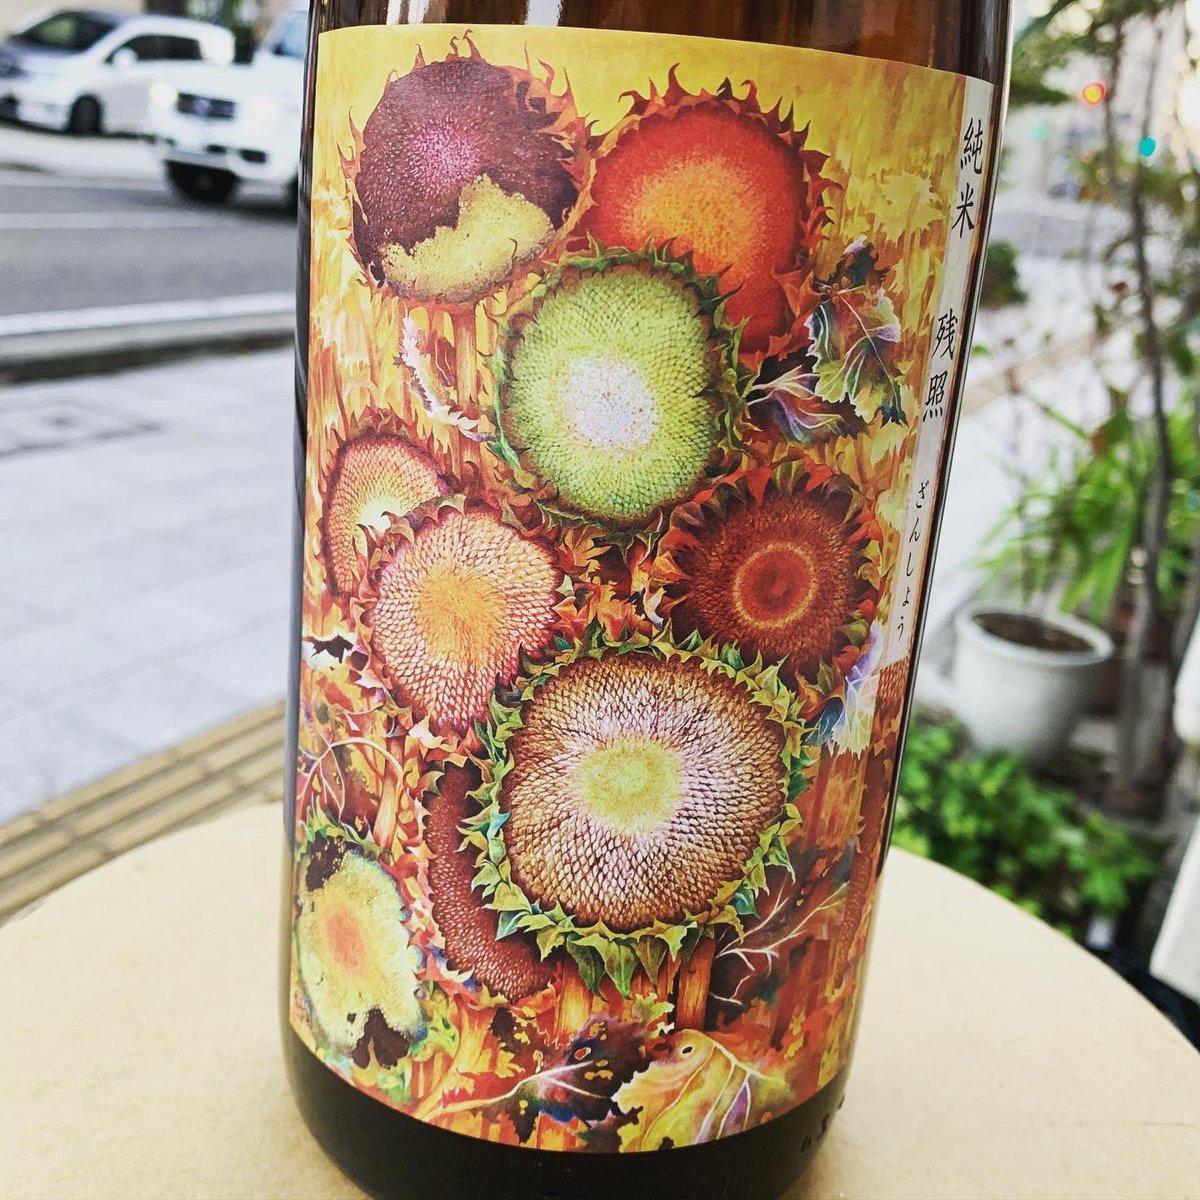 test ツイッターメディア - 北島酒造 (滋賀) ・残照 生酛 純米 R1BY 1800ml 入荷しました! 速醸から酵母無添加の生酛になりました。もちろん燗で。 #日本酒 #sake https://t.co/dVgOnhXsIb